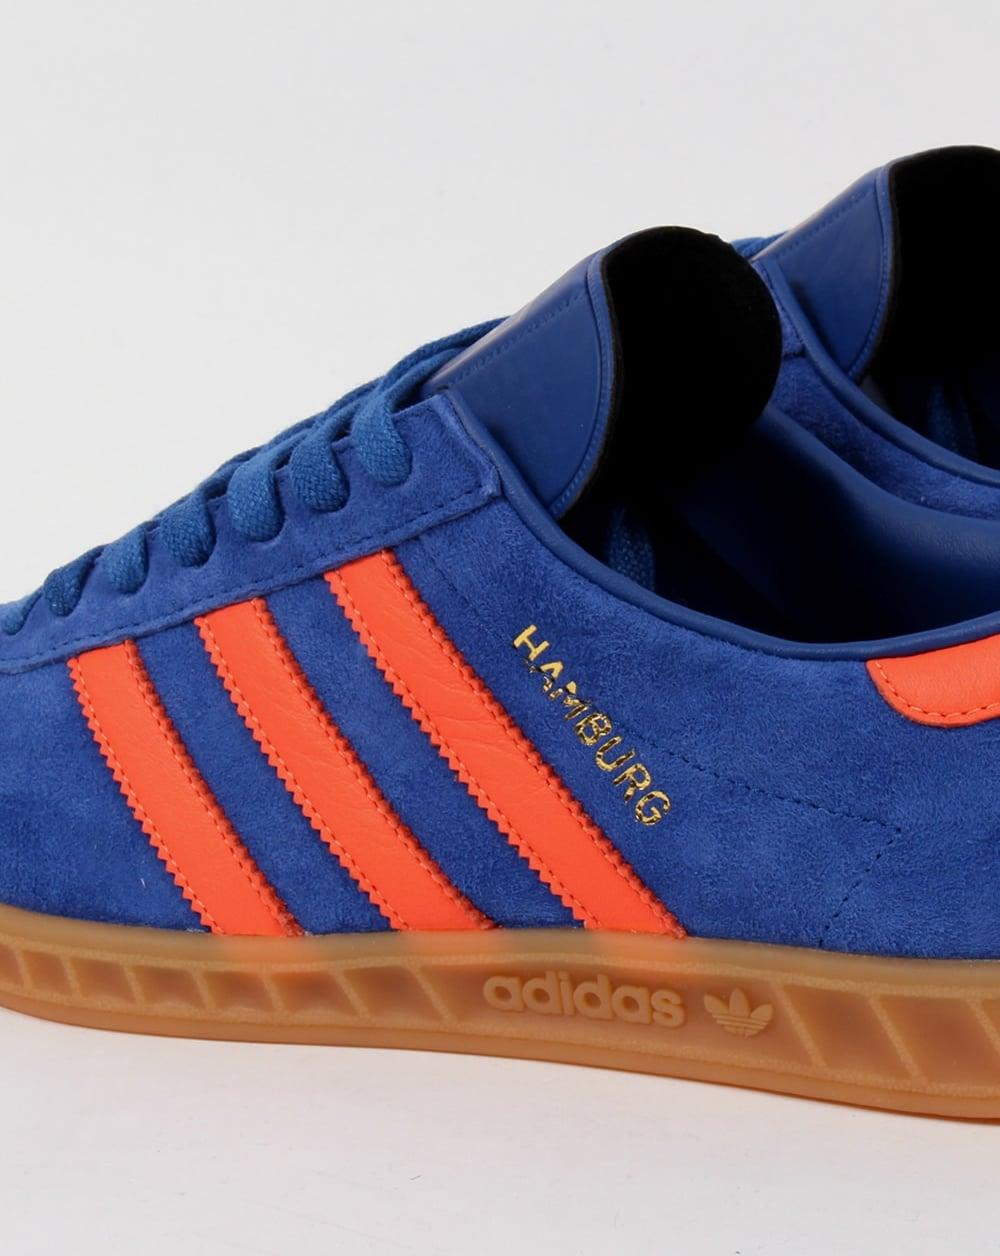 Adidas Originals Top Ten Hi Rare Sneakers New Brown: Adidas Trainers Adidas Originals Hamburg Trainers Royal